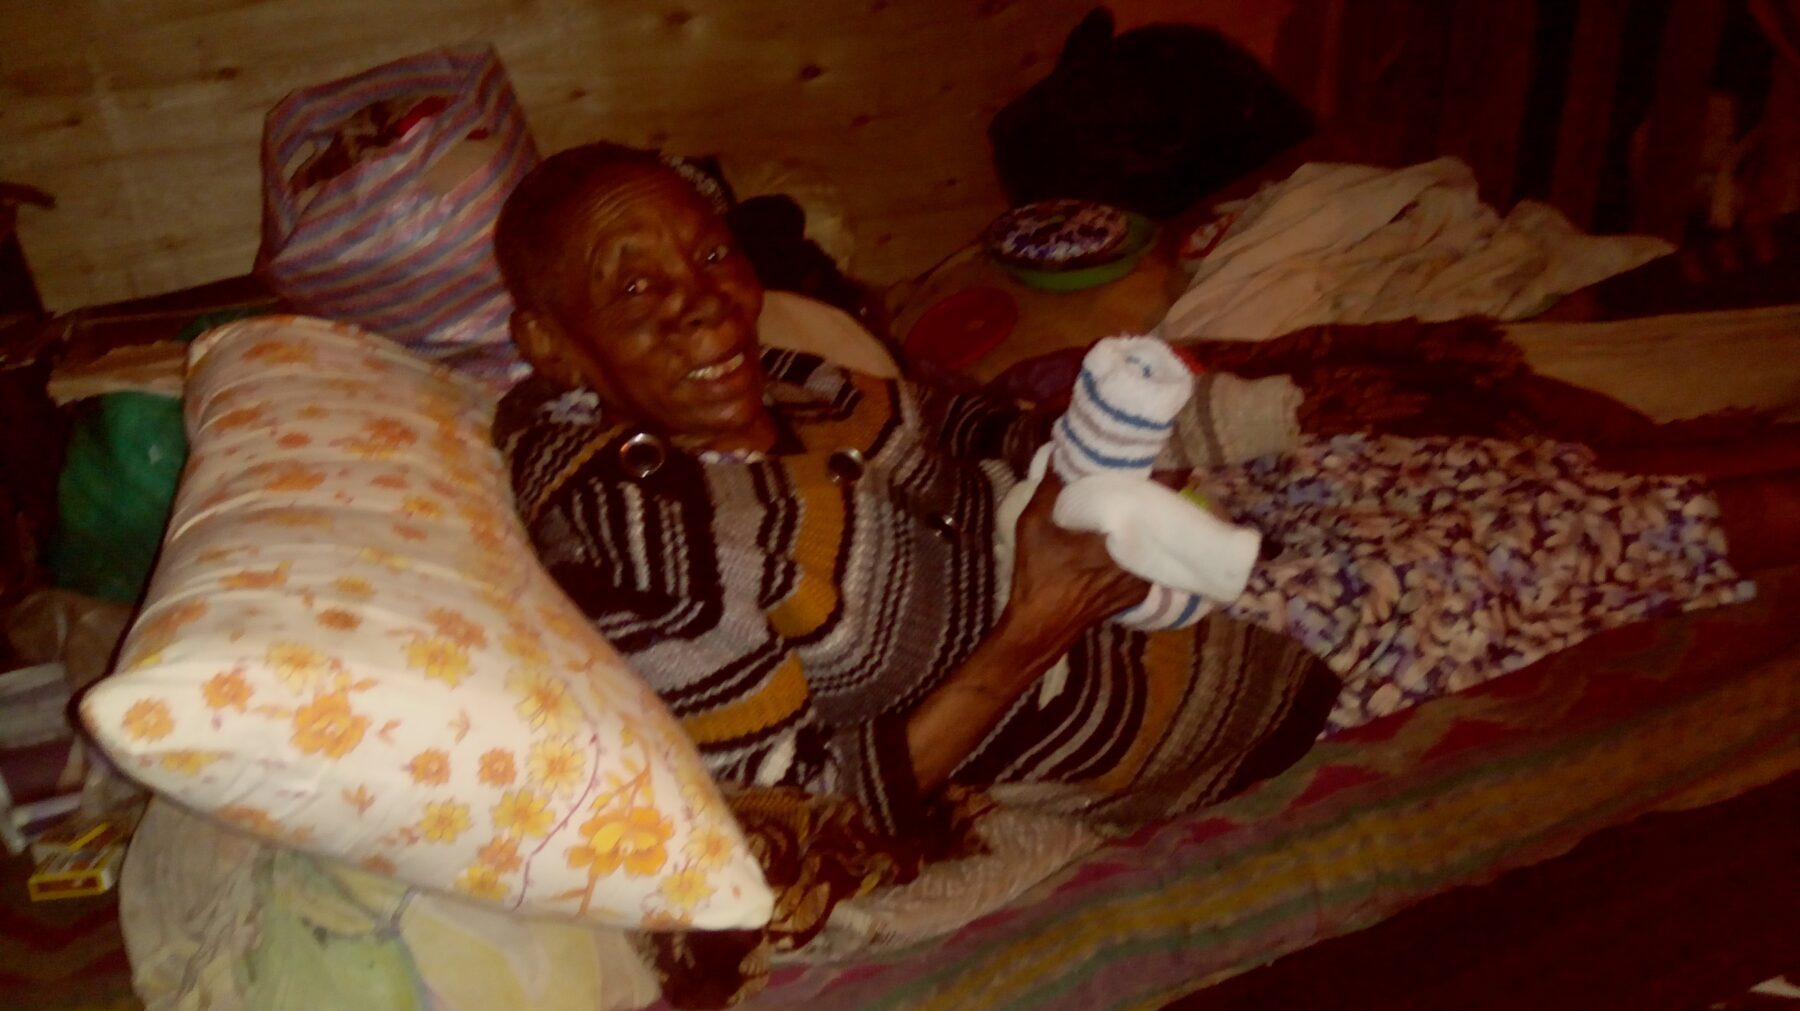 Mary wairimu happy to have new socks